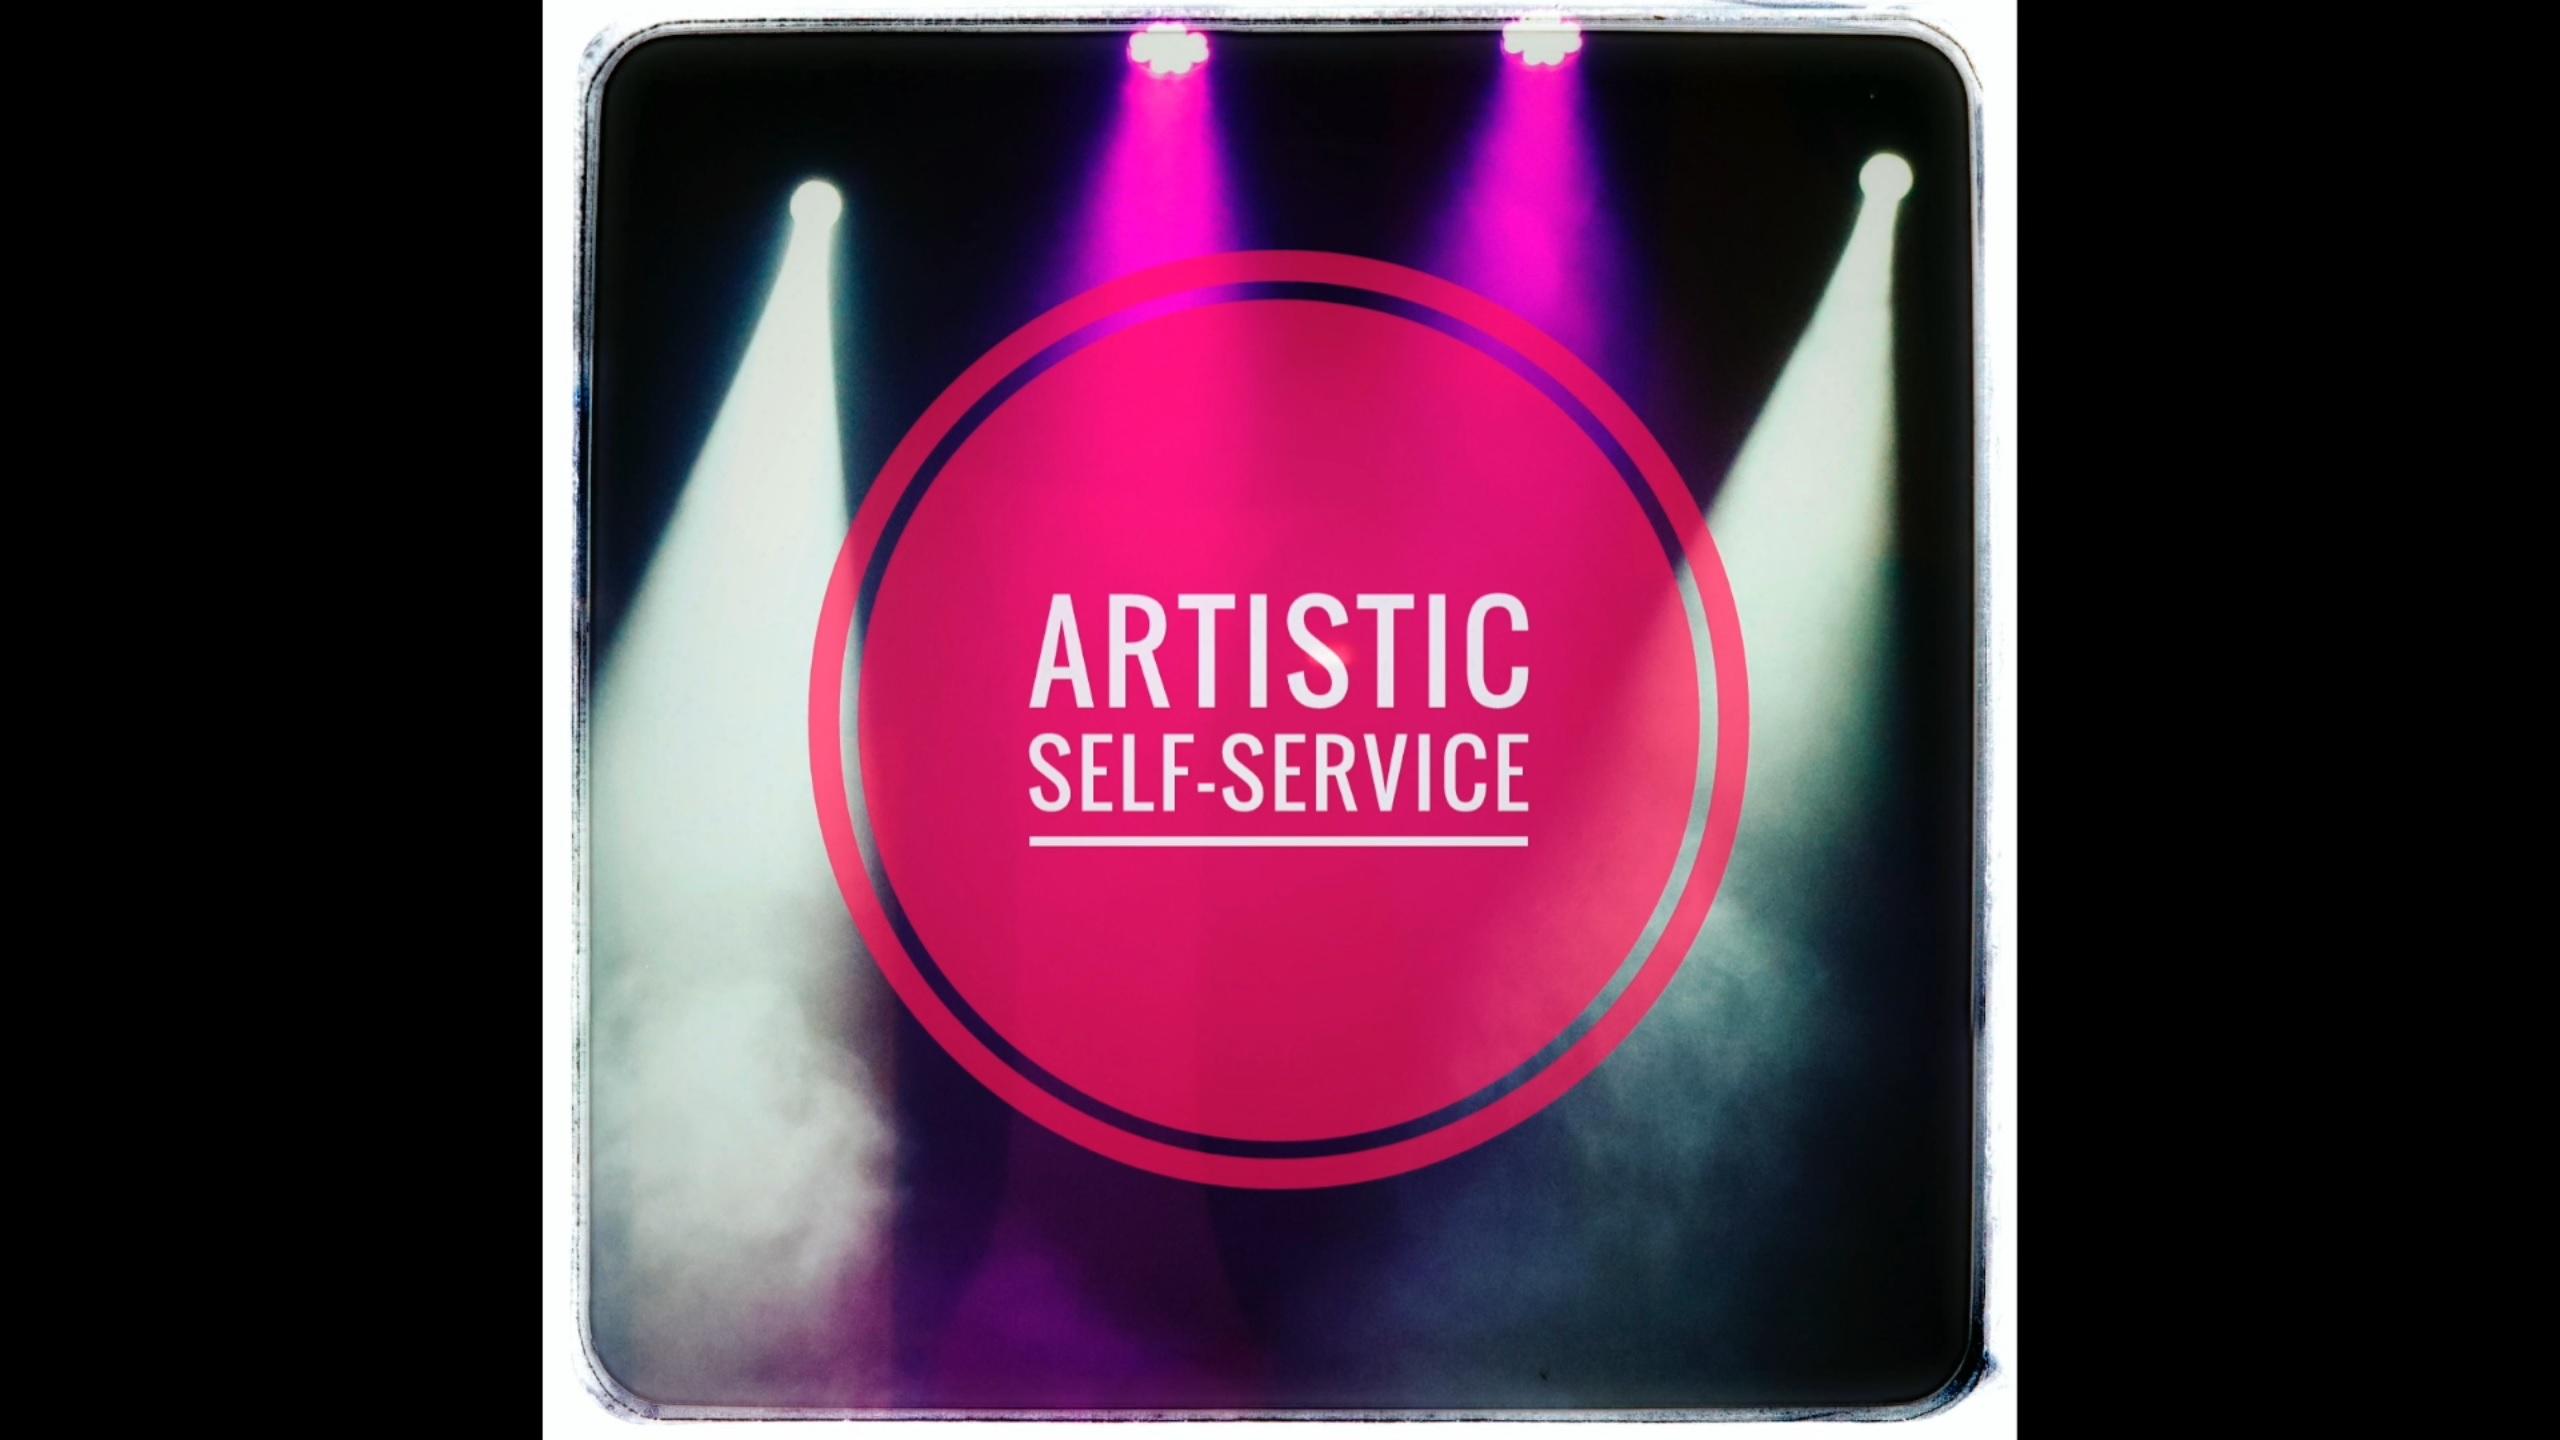 Artistic Self Service